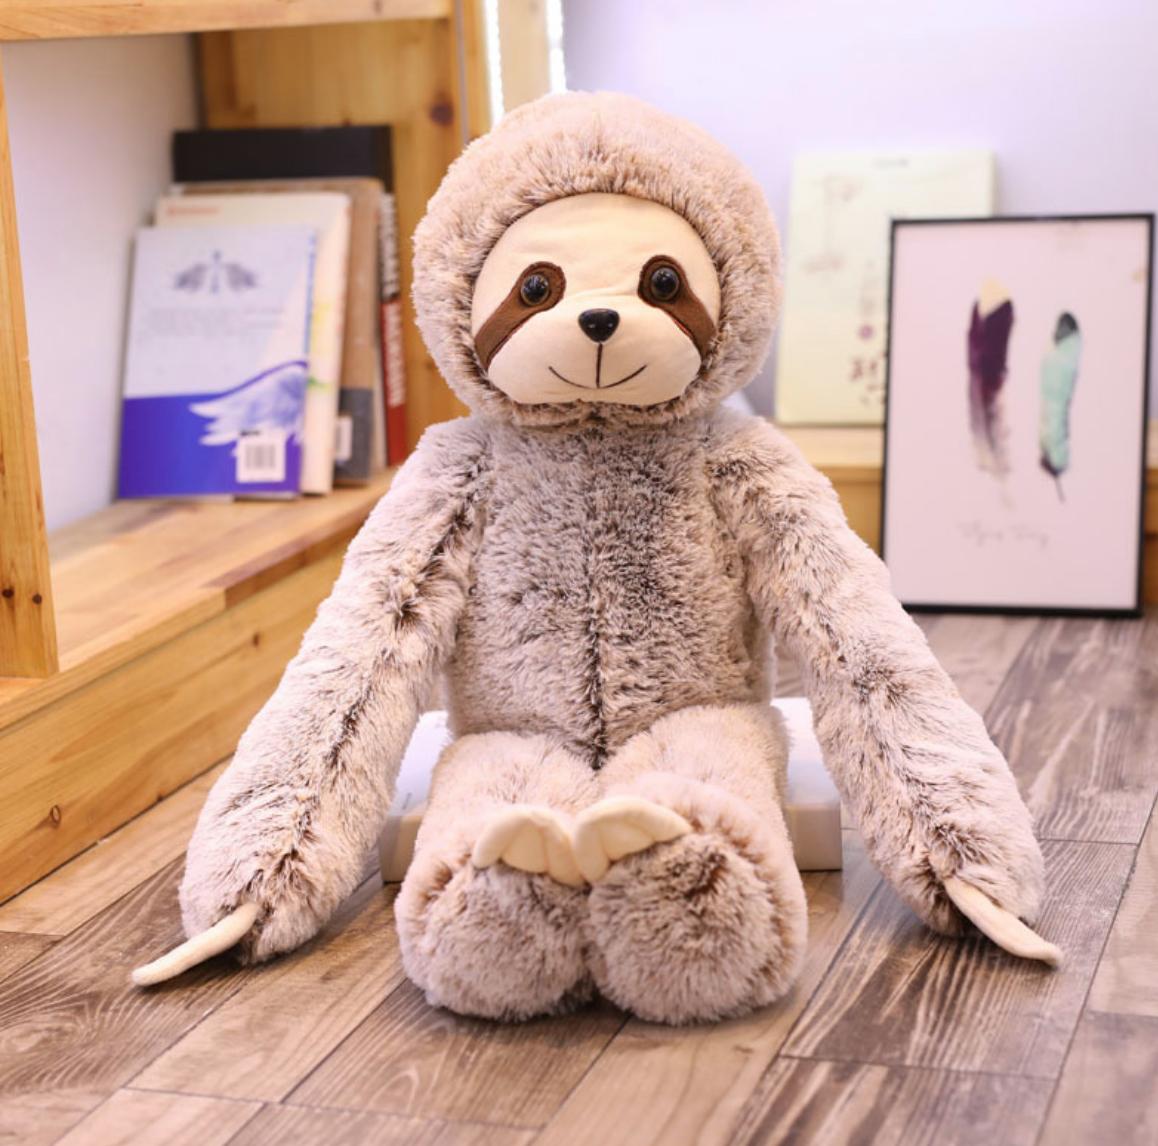 Fluffy Sloth Plush